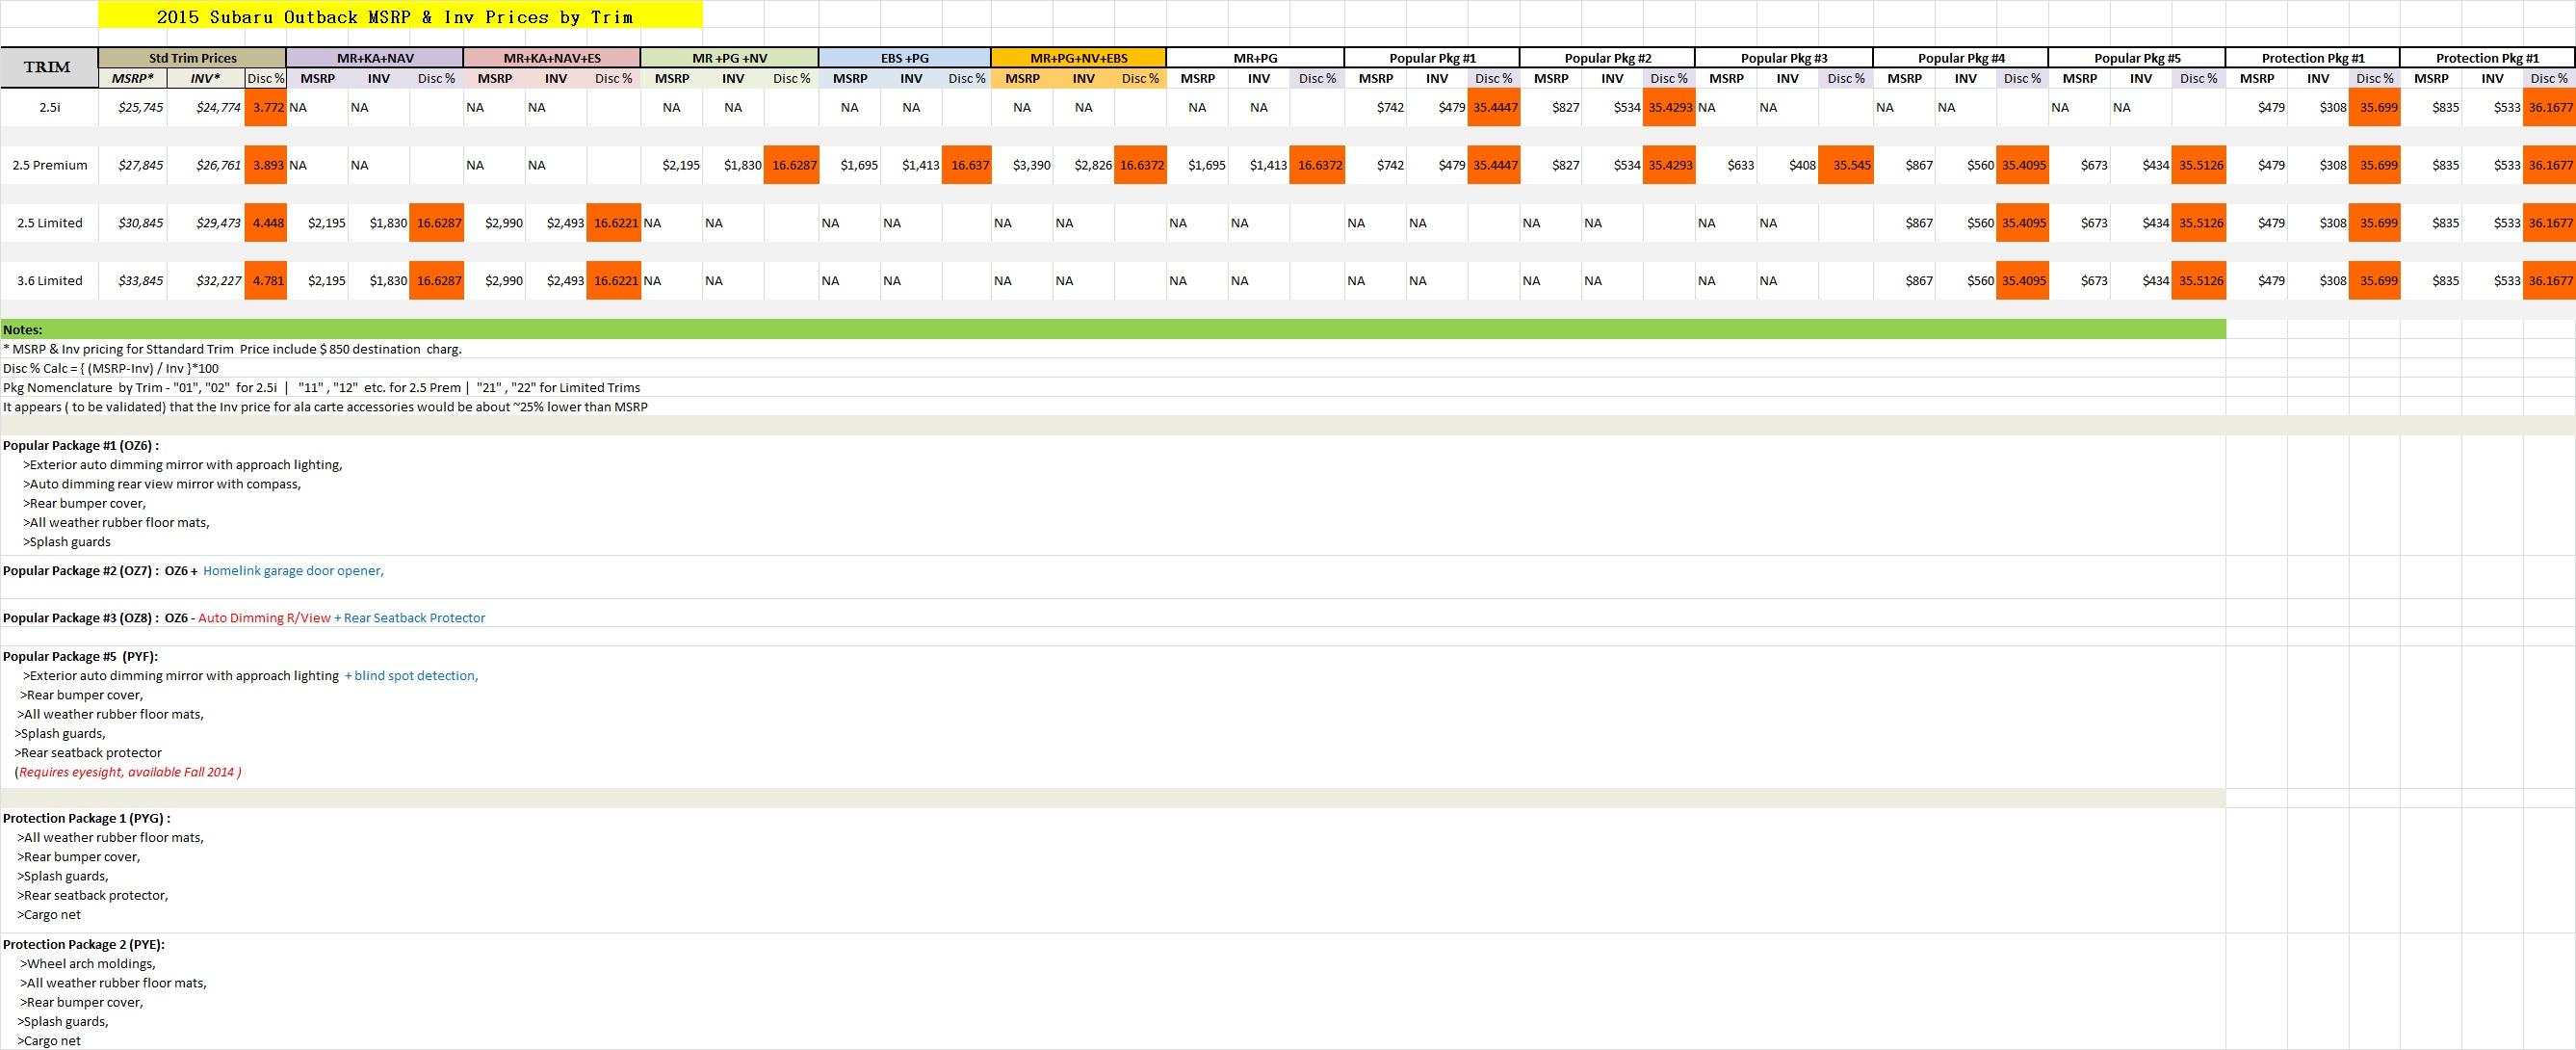 Invoice Pricing And Invoice Options Pricing Page Subaru - Subaru outback invoice price